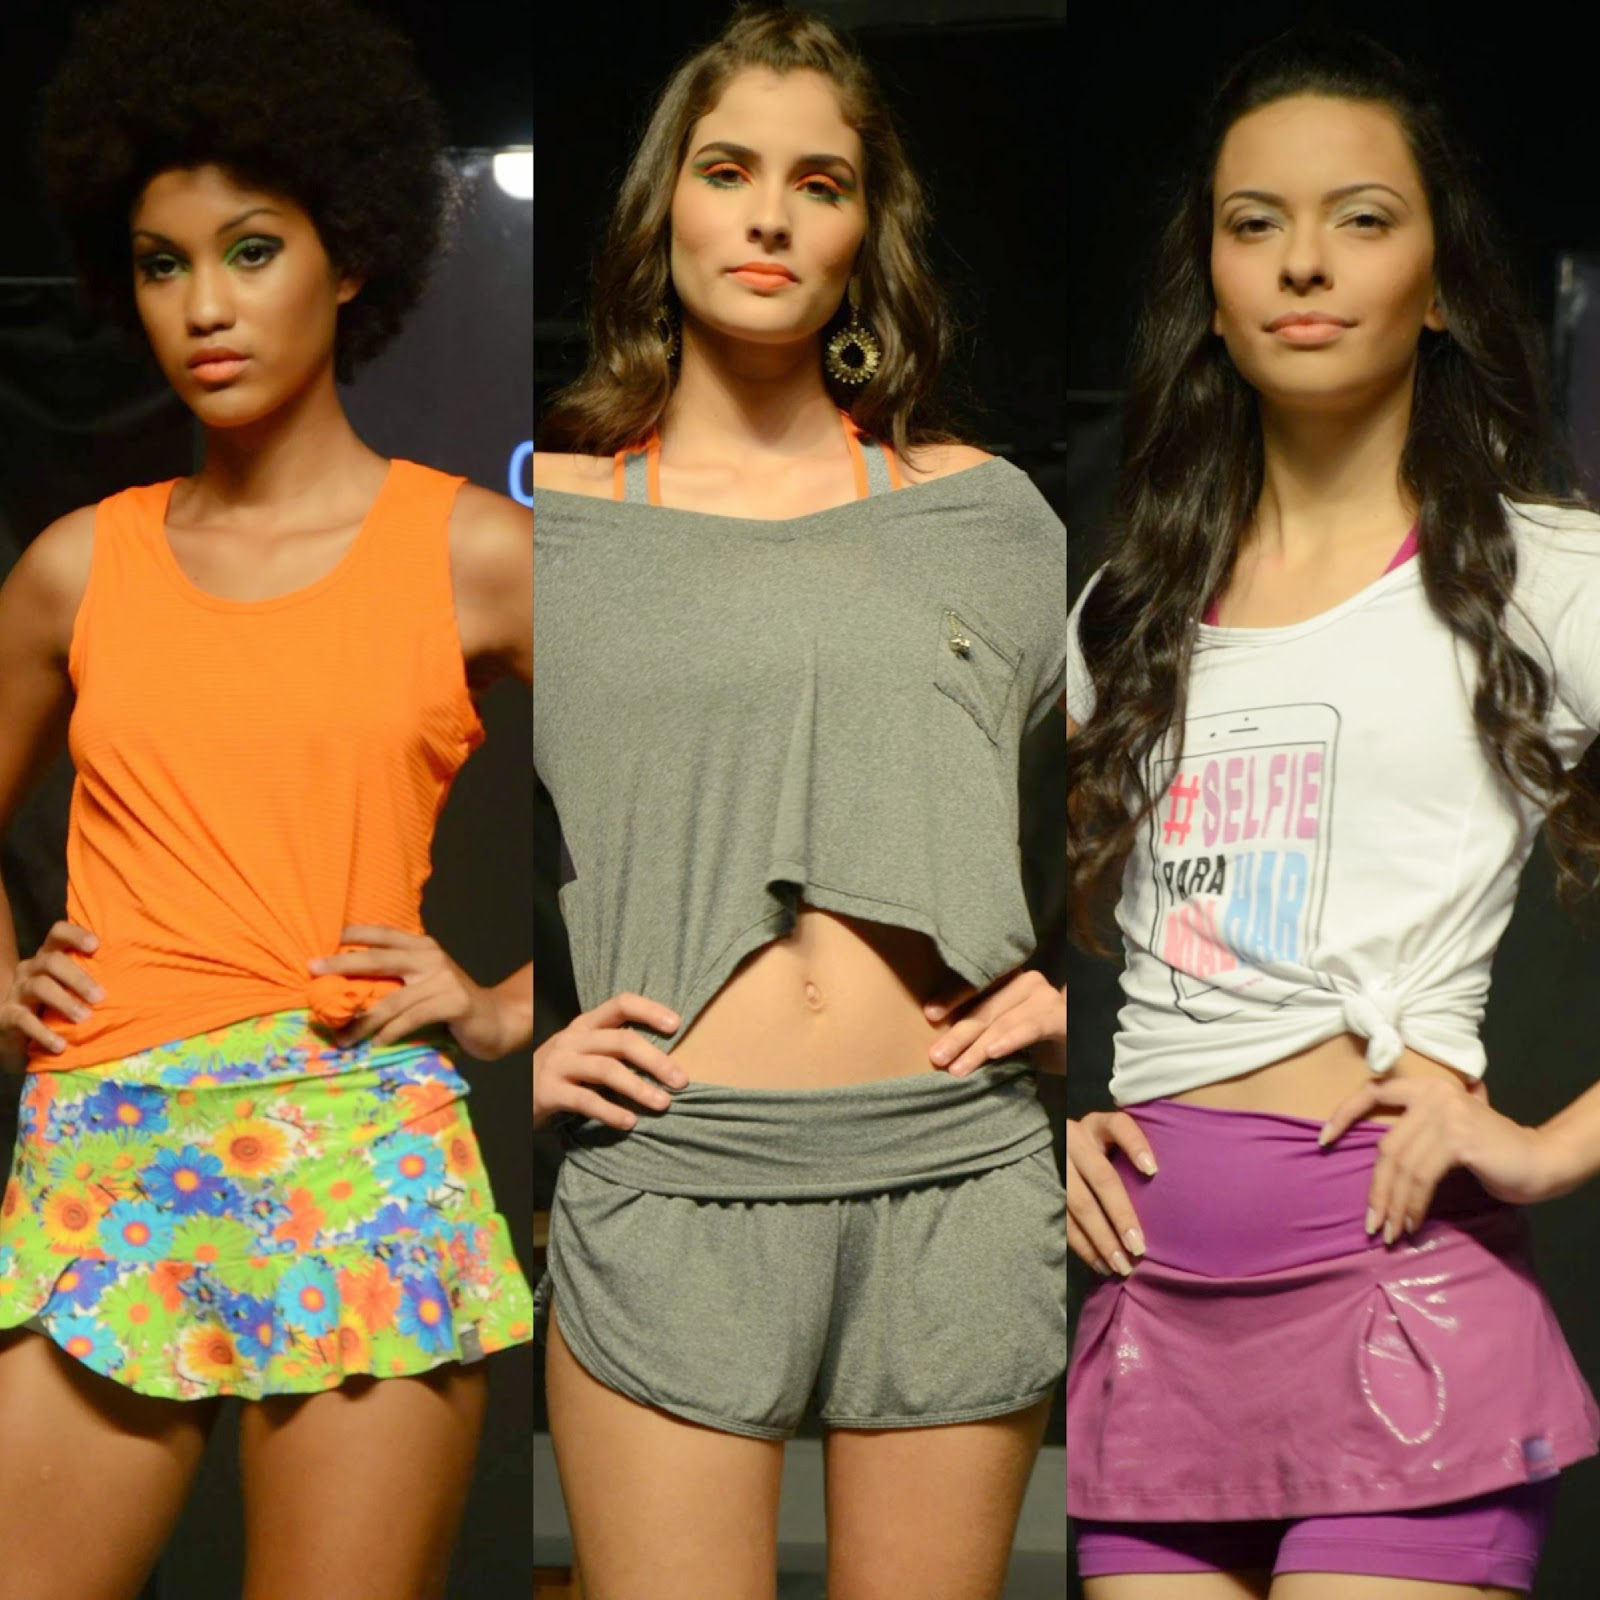 e4f77e3a6e Delírios de Consumista por Jessica Viégas  FMF 2015 - Moda Fitness